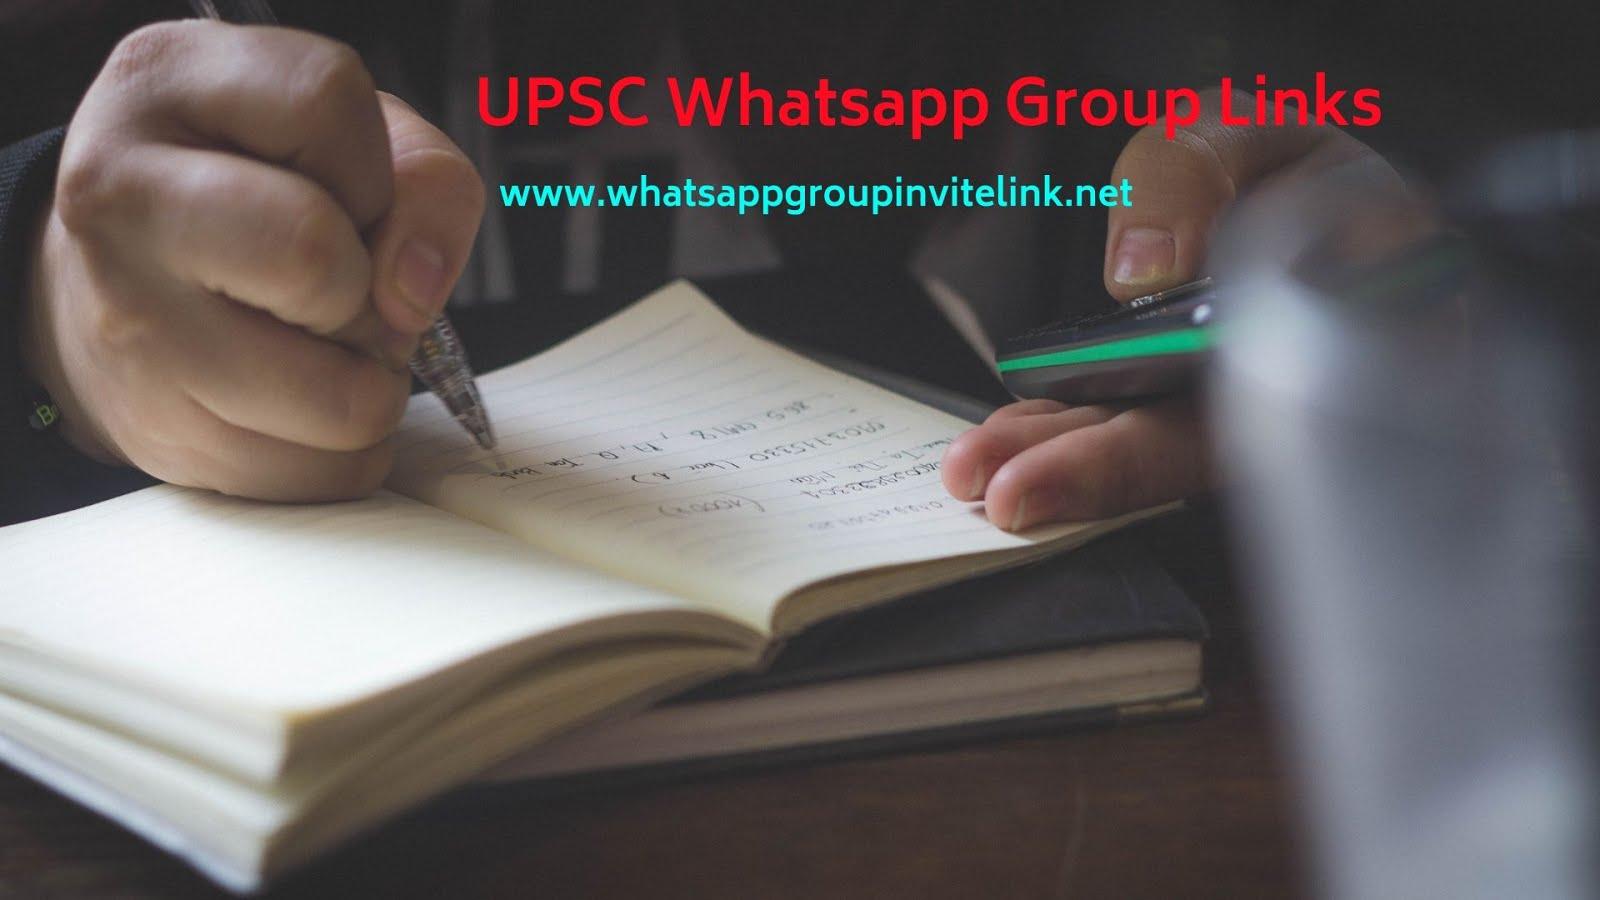 Whatsapp Group Invite Links: UPSC Whatsapp Group Links